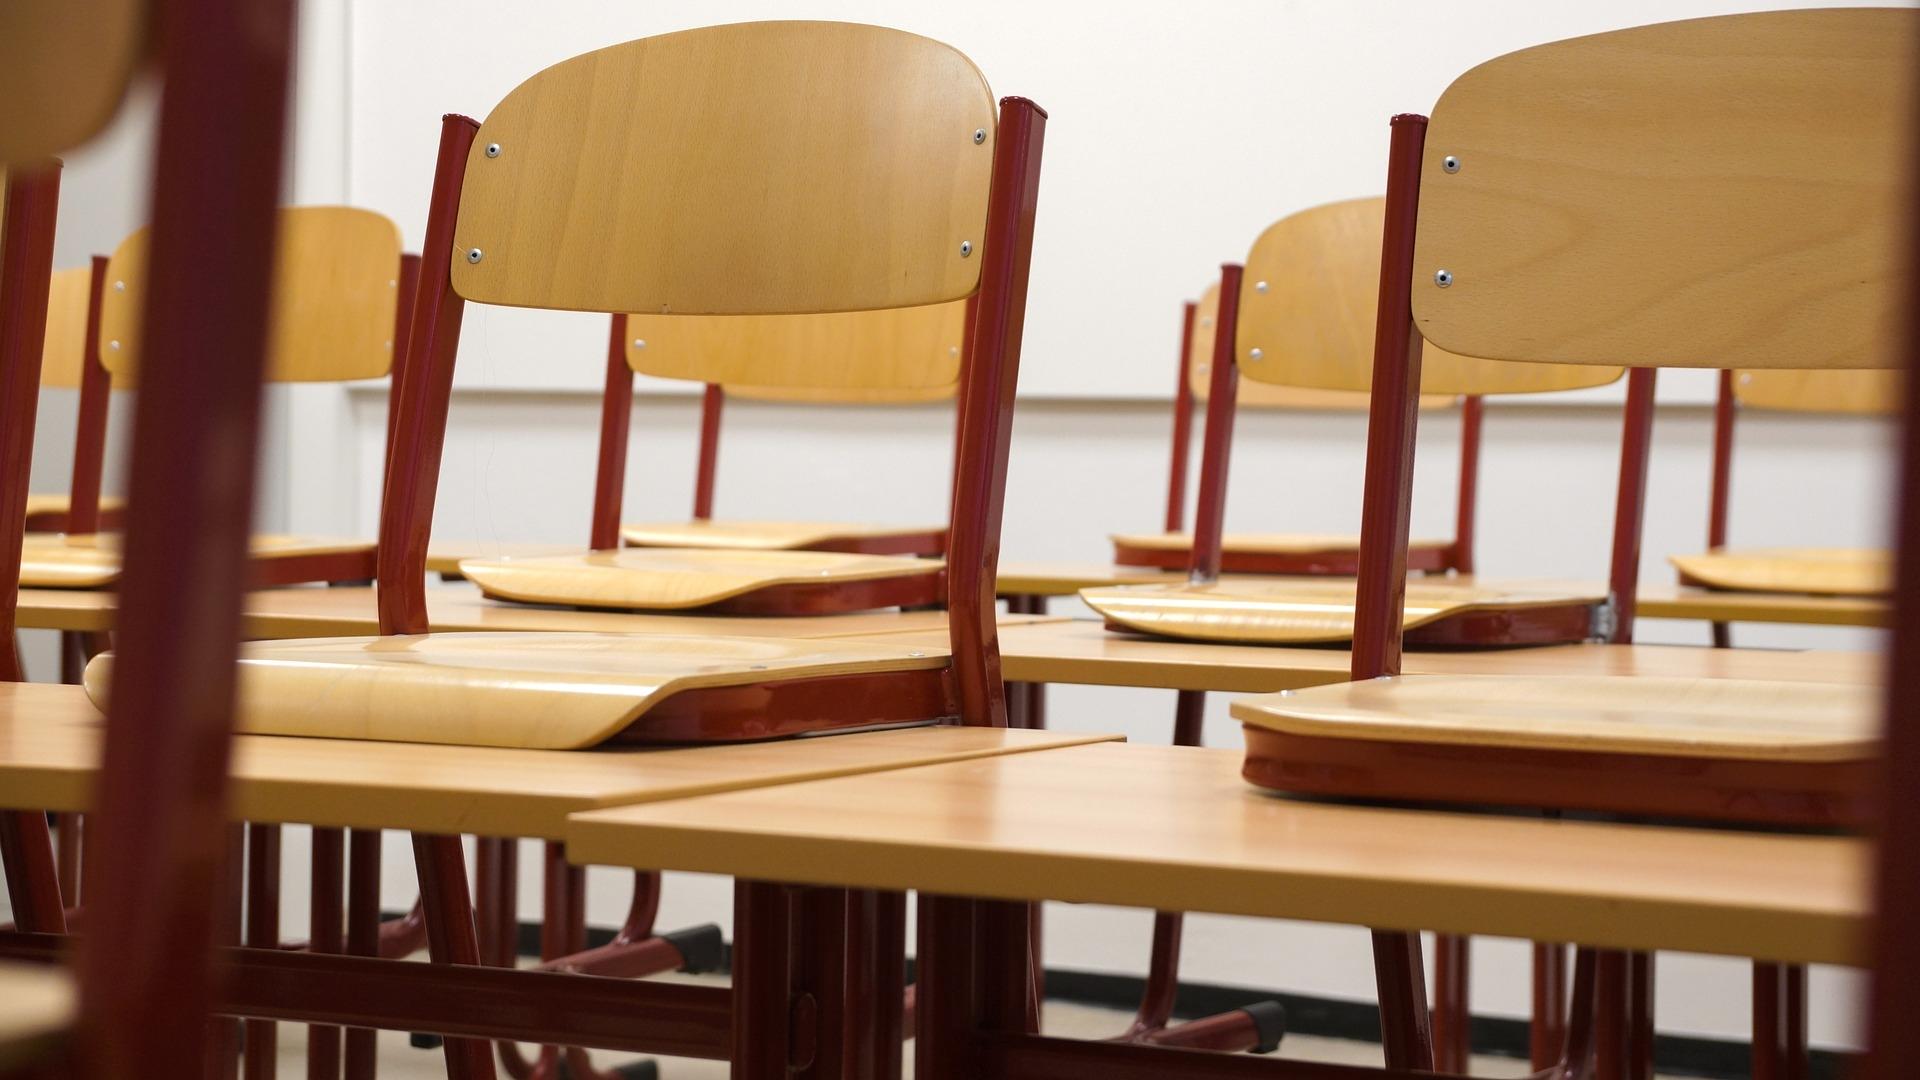 Classroom - 824120 - 1920